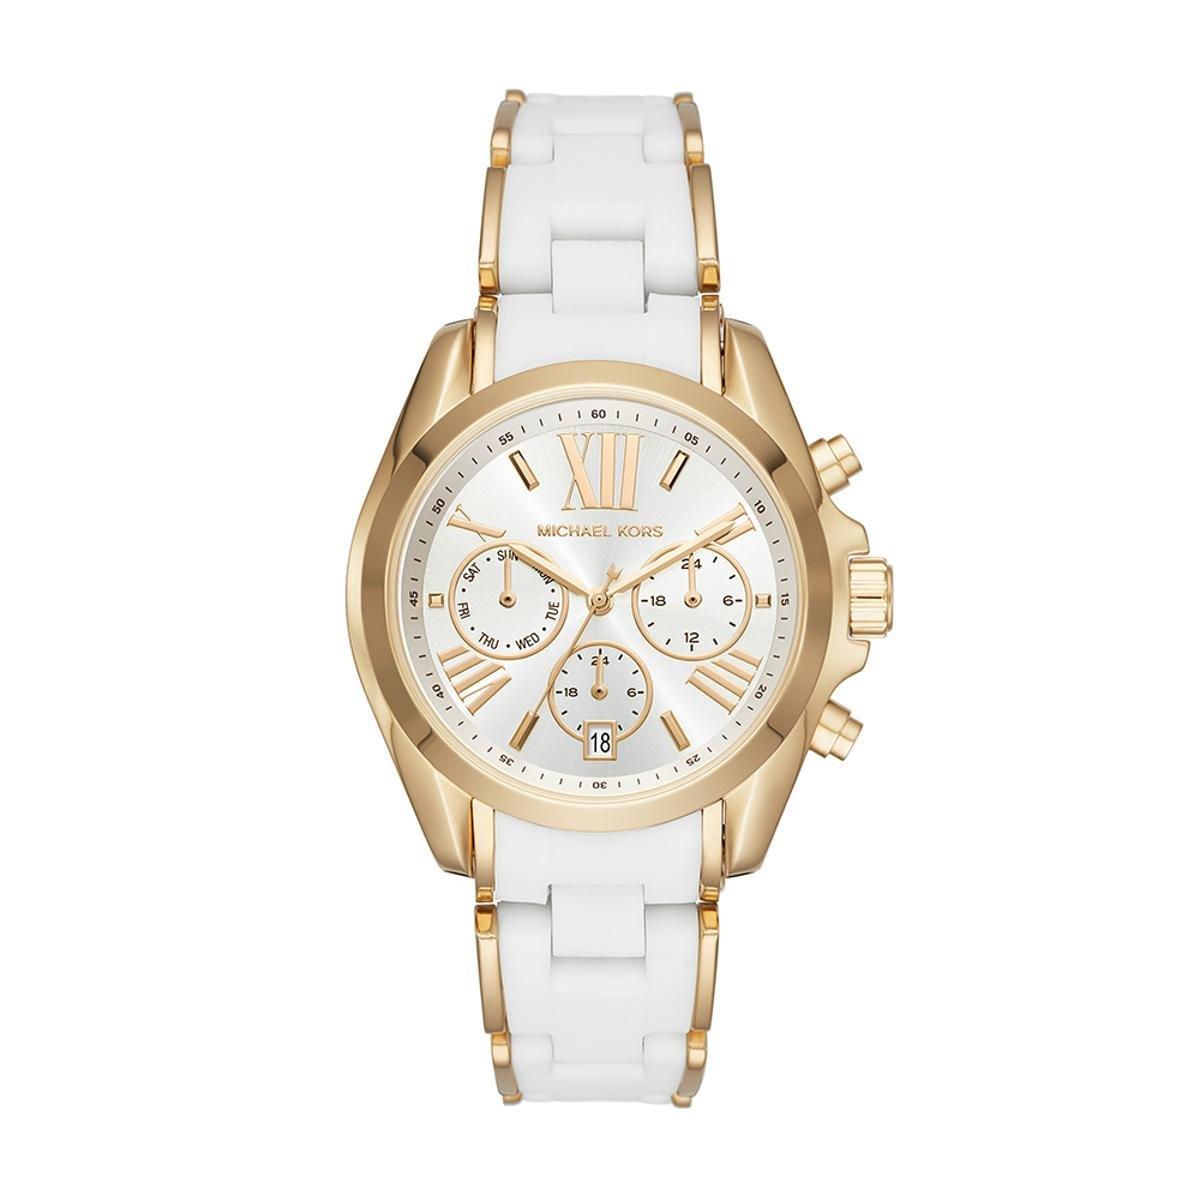 6f3aecf32a624 Relógio Michael Kors Feminino Bradshaw - MK6578 1BN MK6578 1BN - Compre  Agora